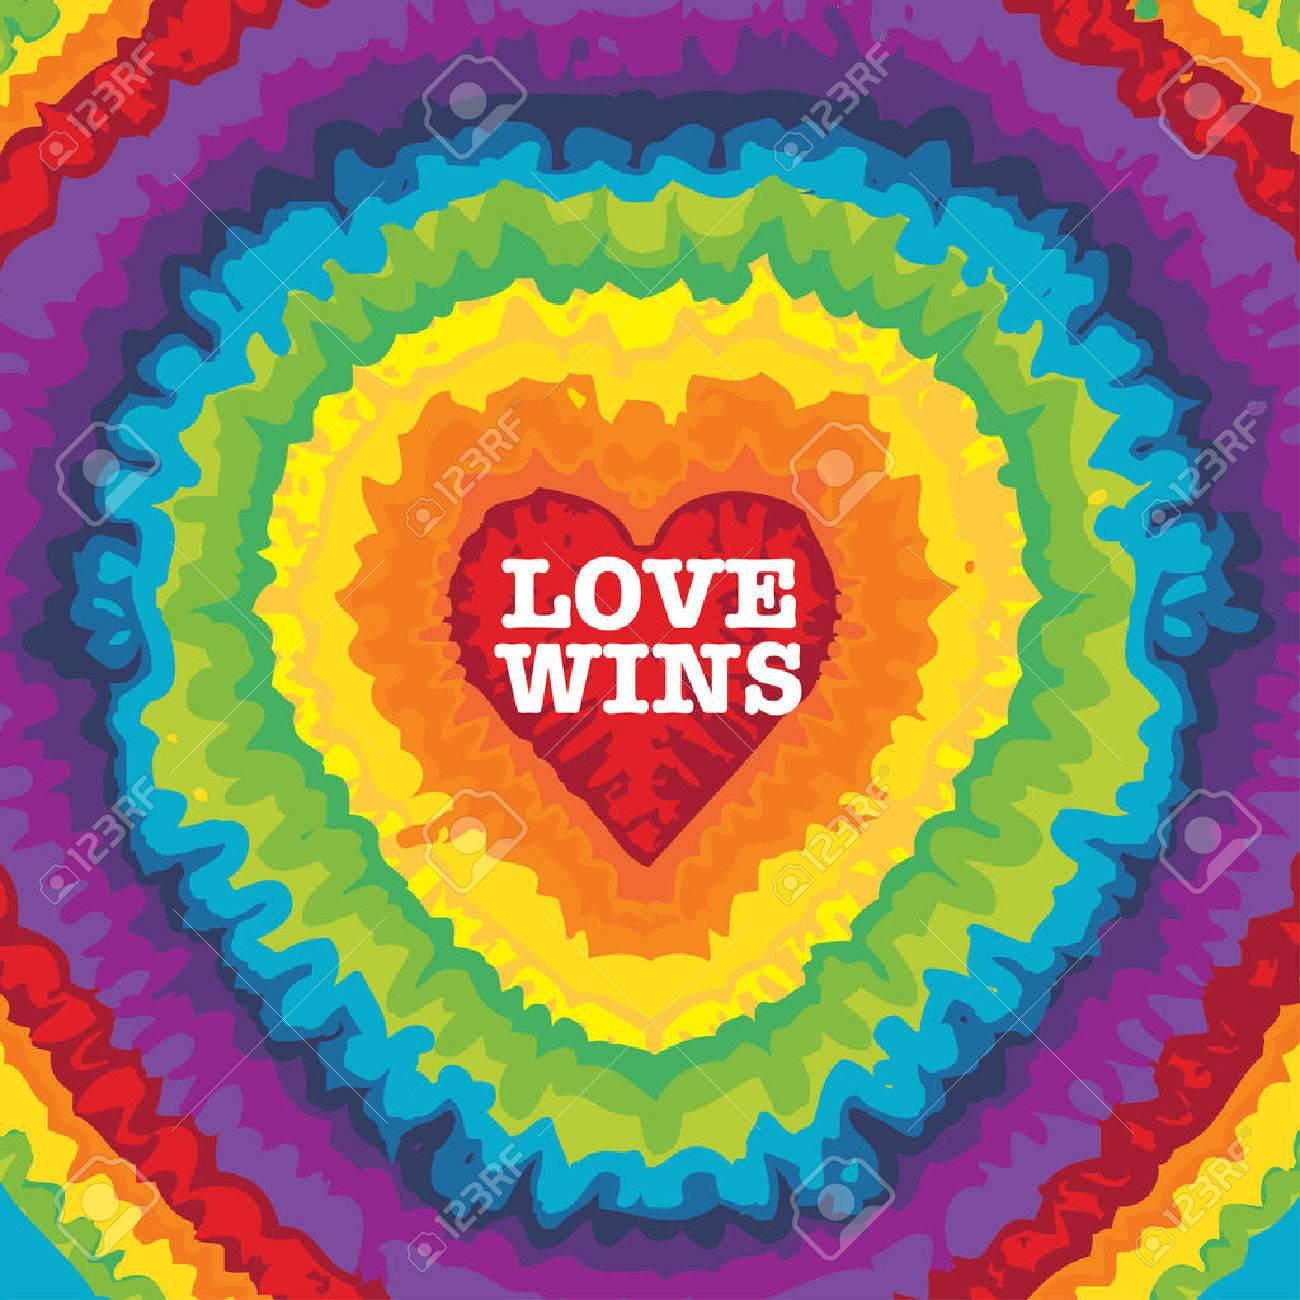 LOVE WINS illustration - 51980214